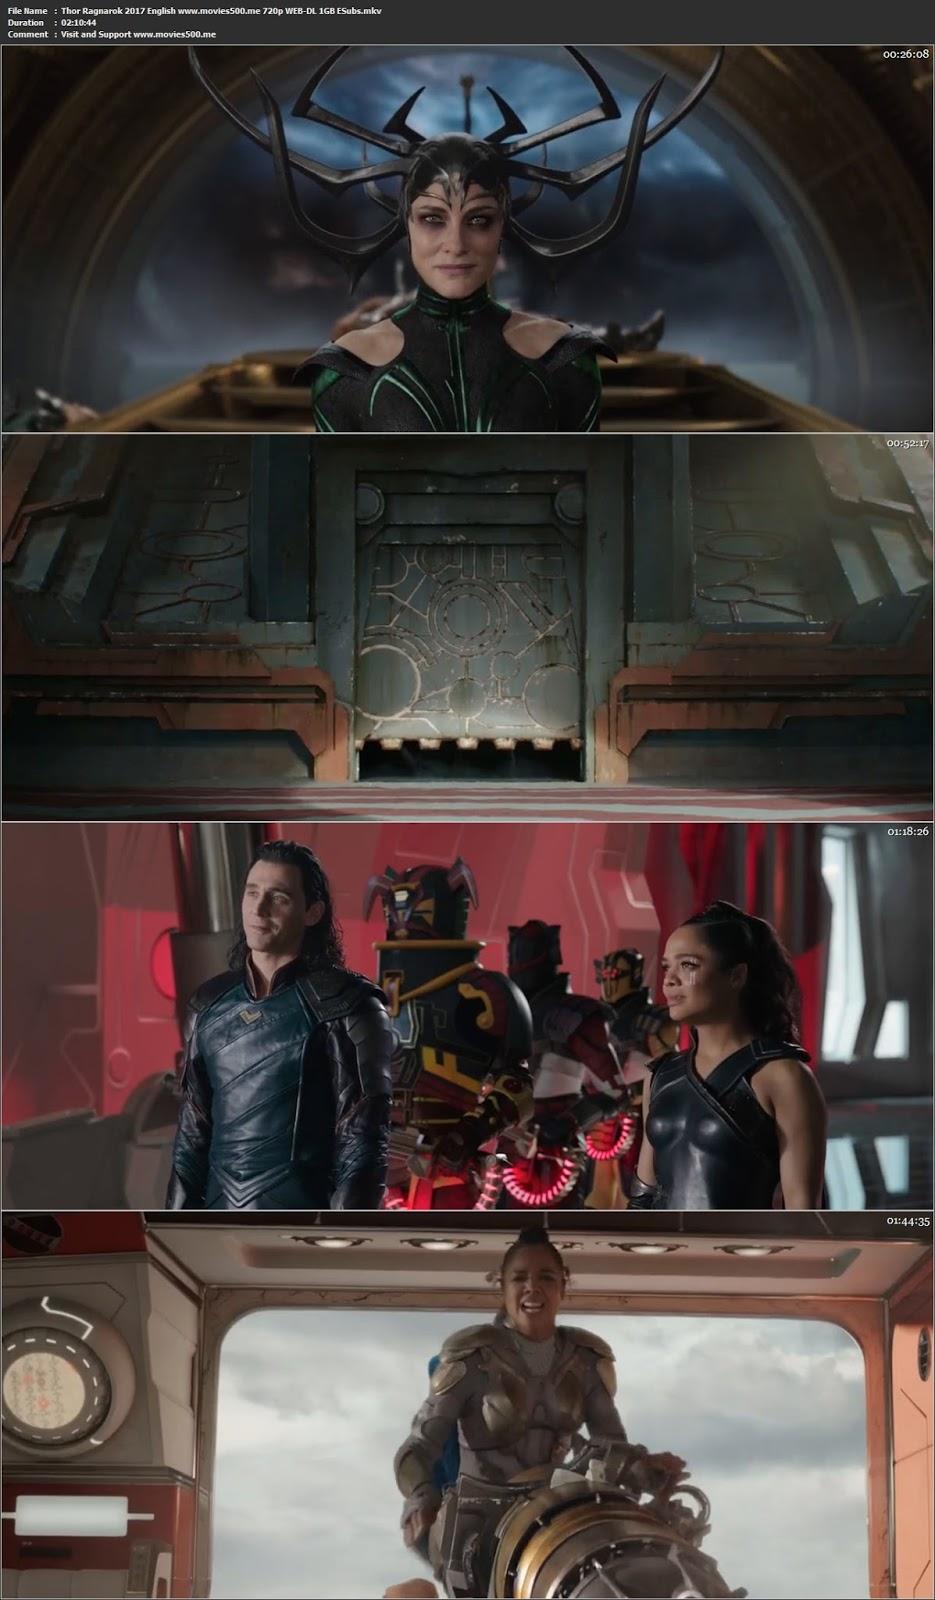 Thor Ragnarok 2017 Dual Audio Hind Movie WEB DL 720p 1GB at newbtcbank.com